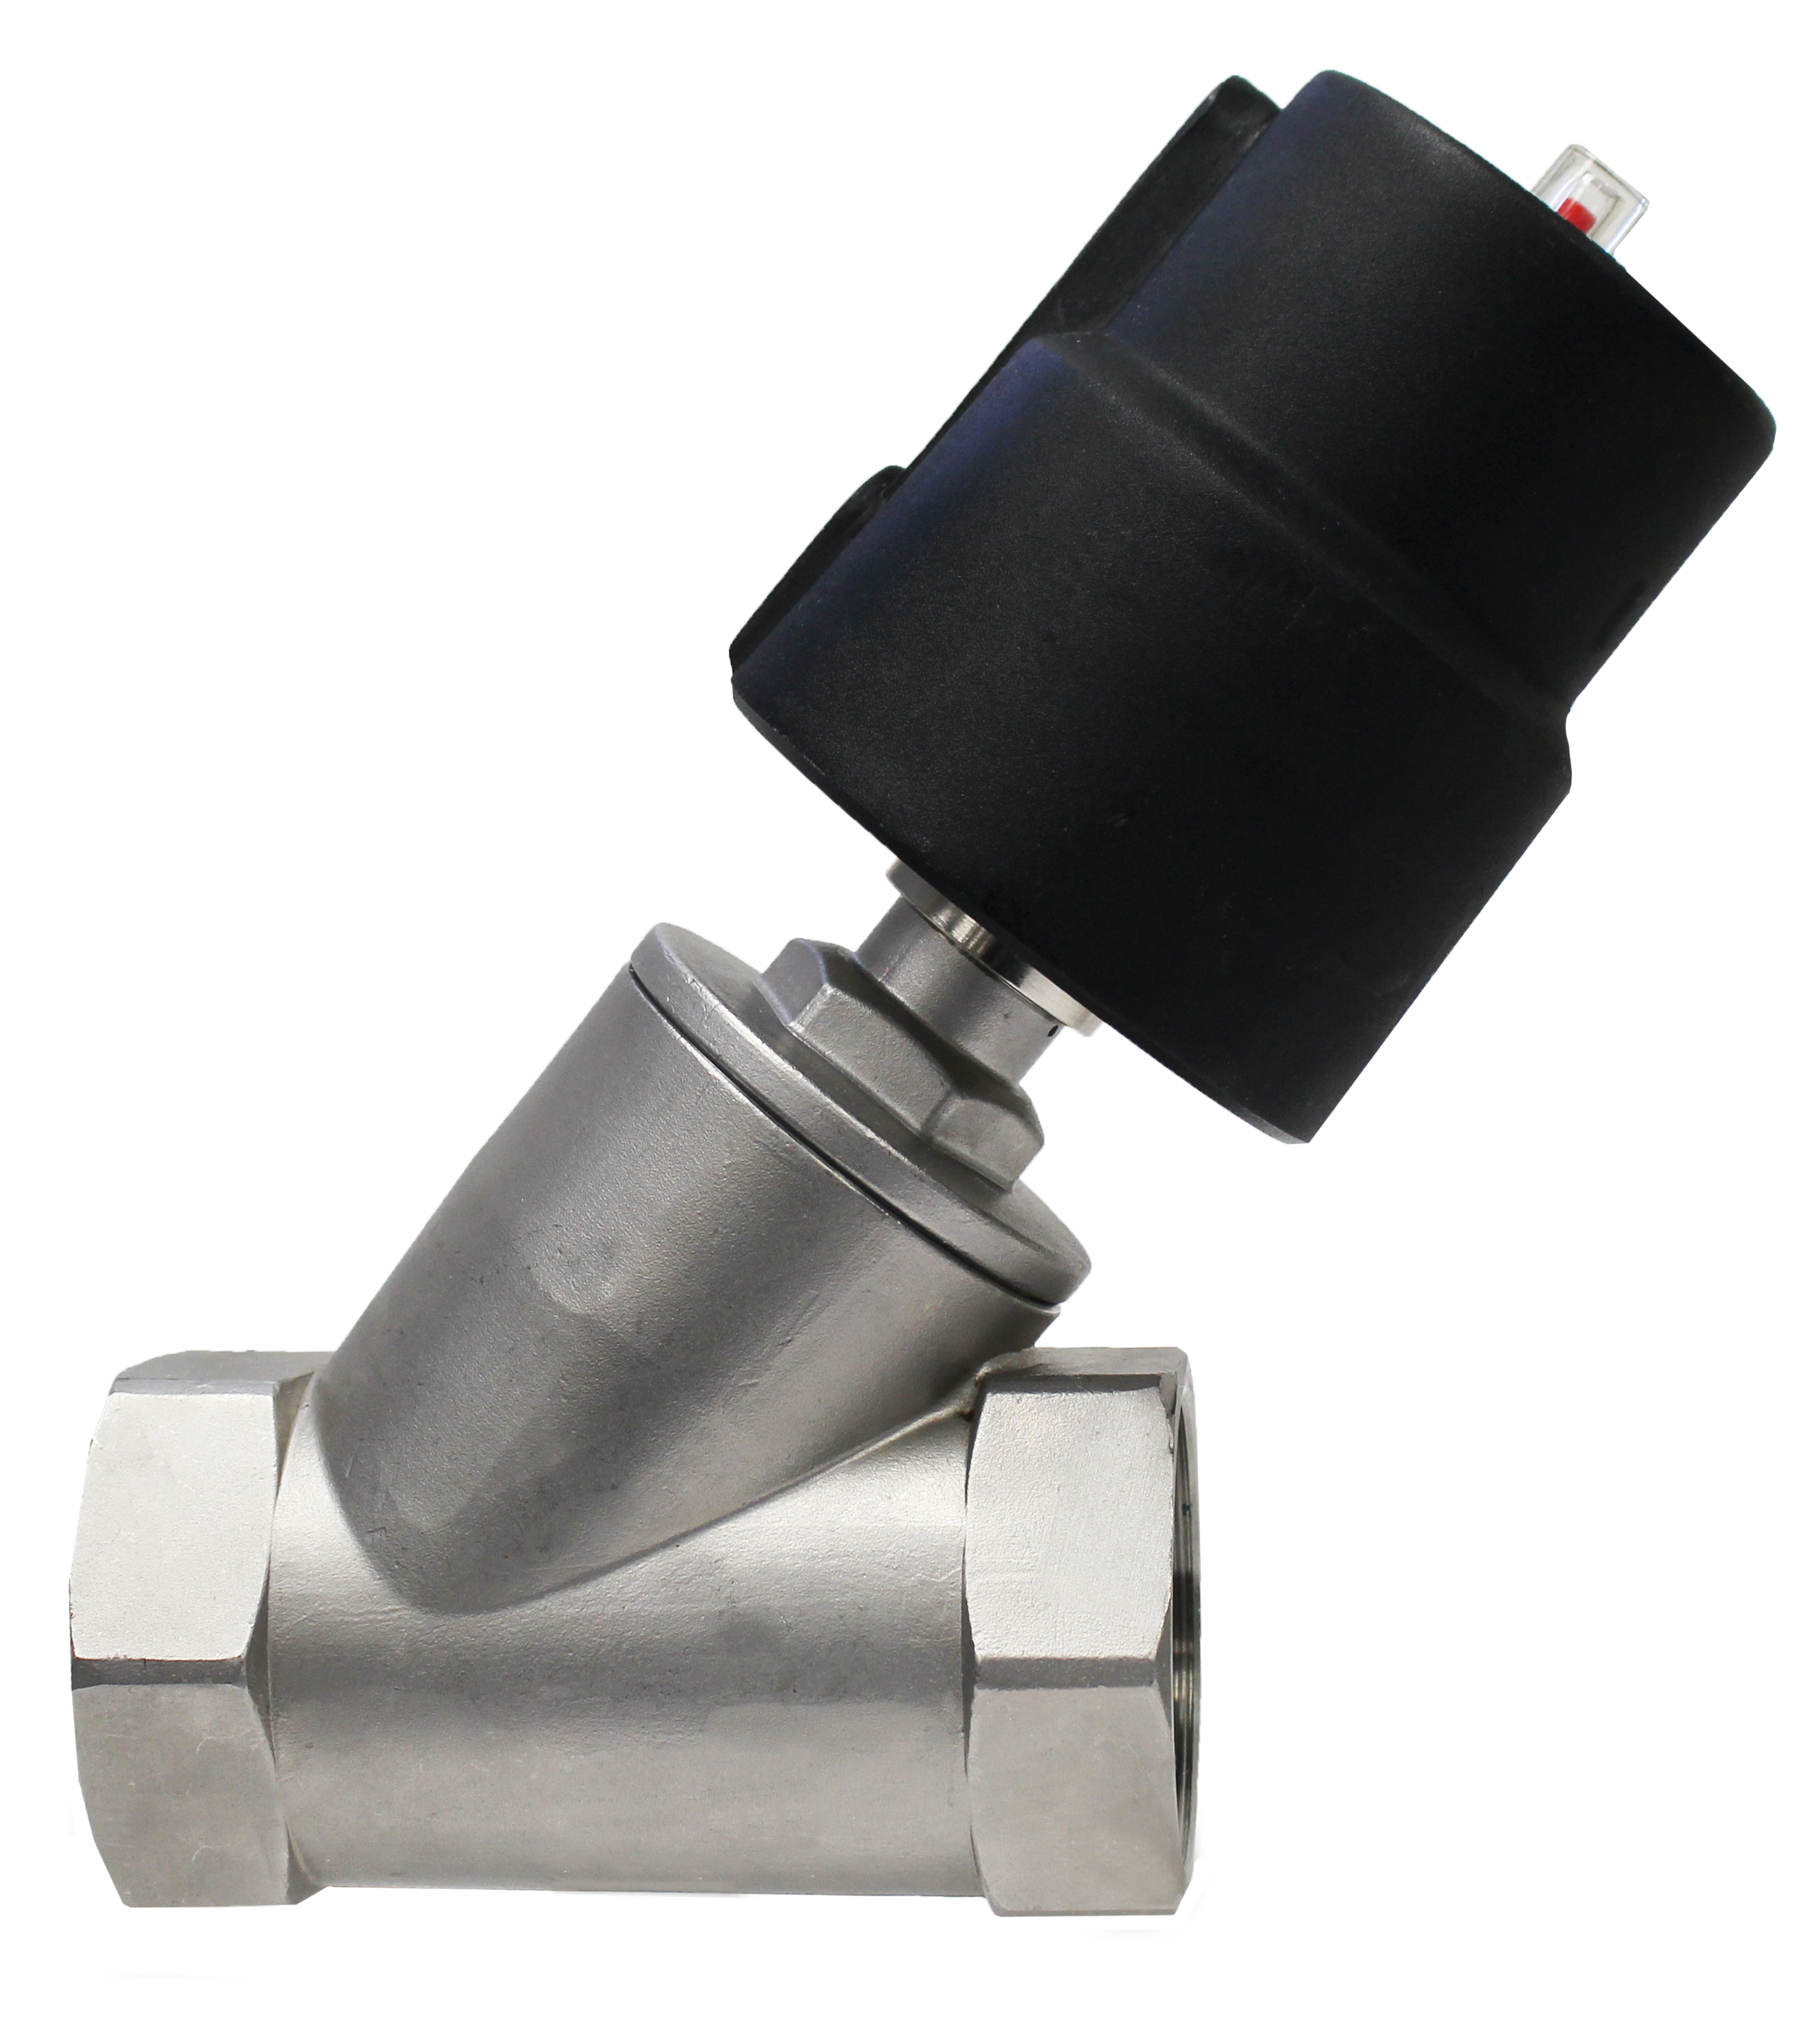 KINGSTON PNEUMTIC ANGLE VALVE KAV angle seat valve